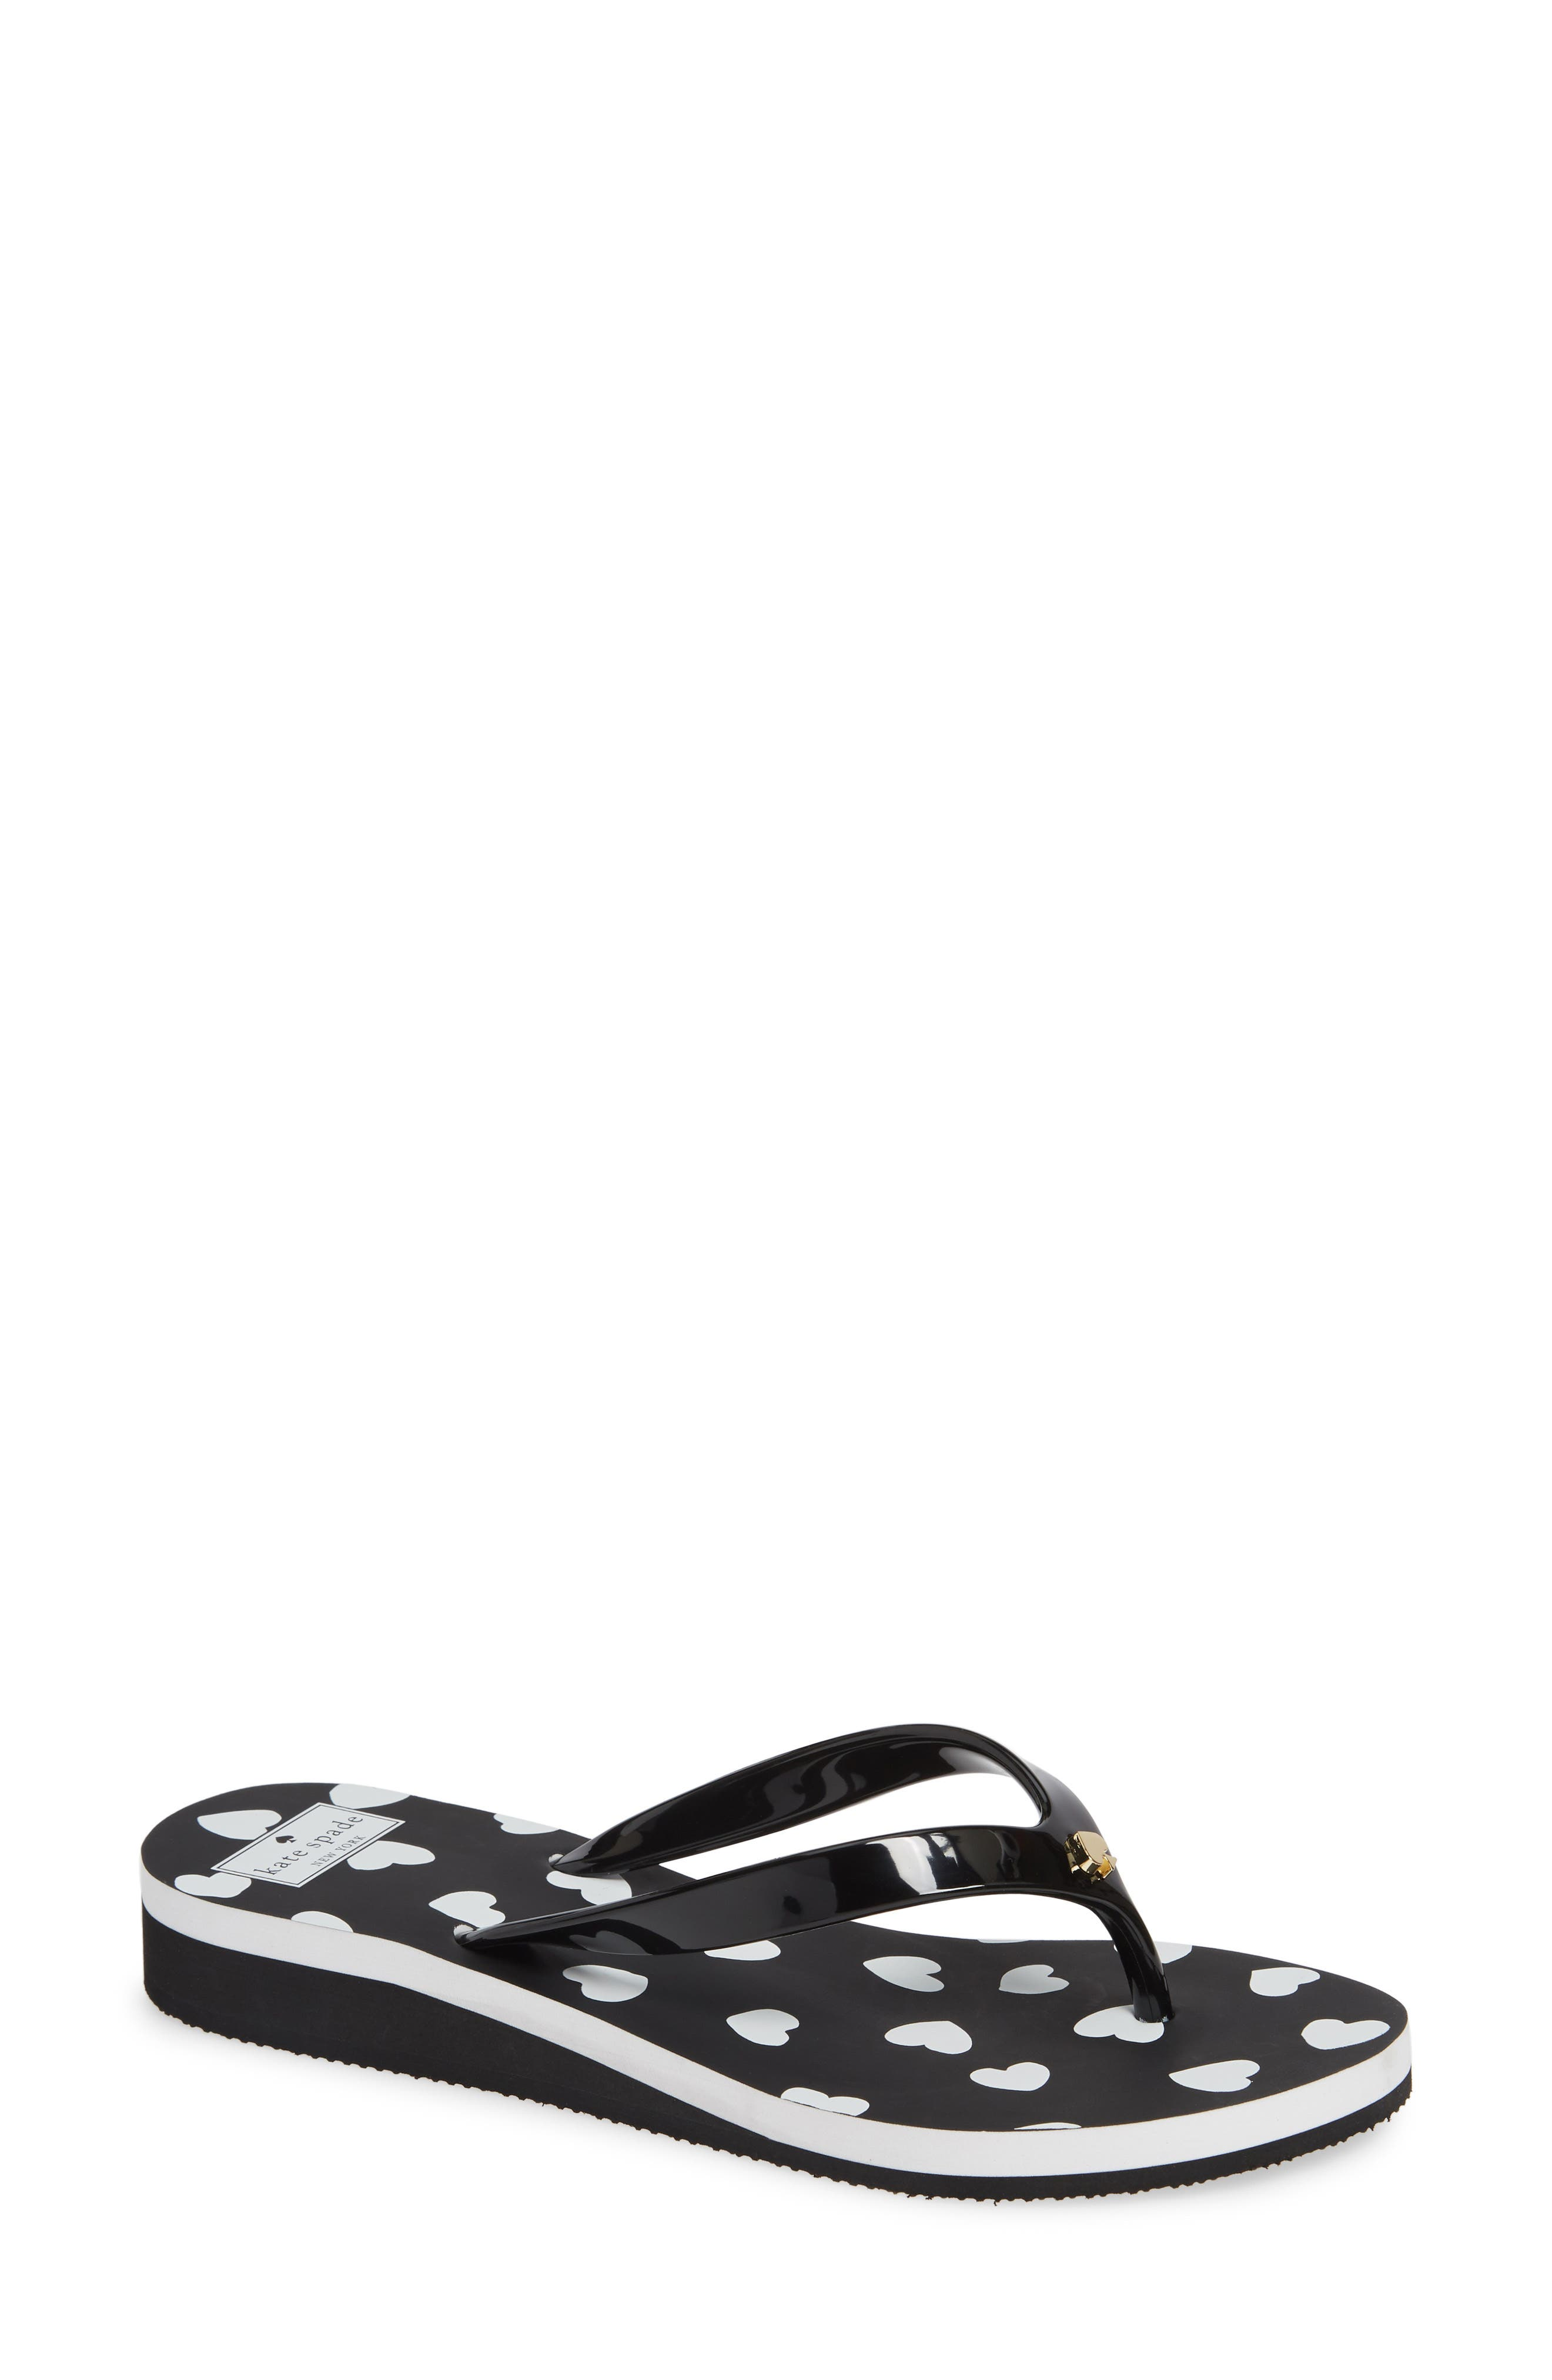 milli wedge flip-flop, Main, color, BLACK/ WHITE HEART